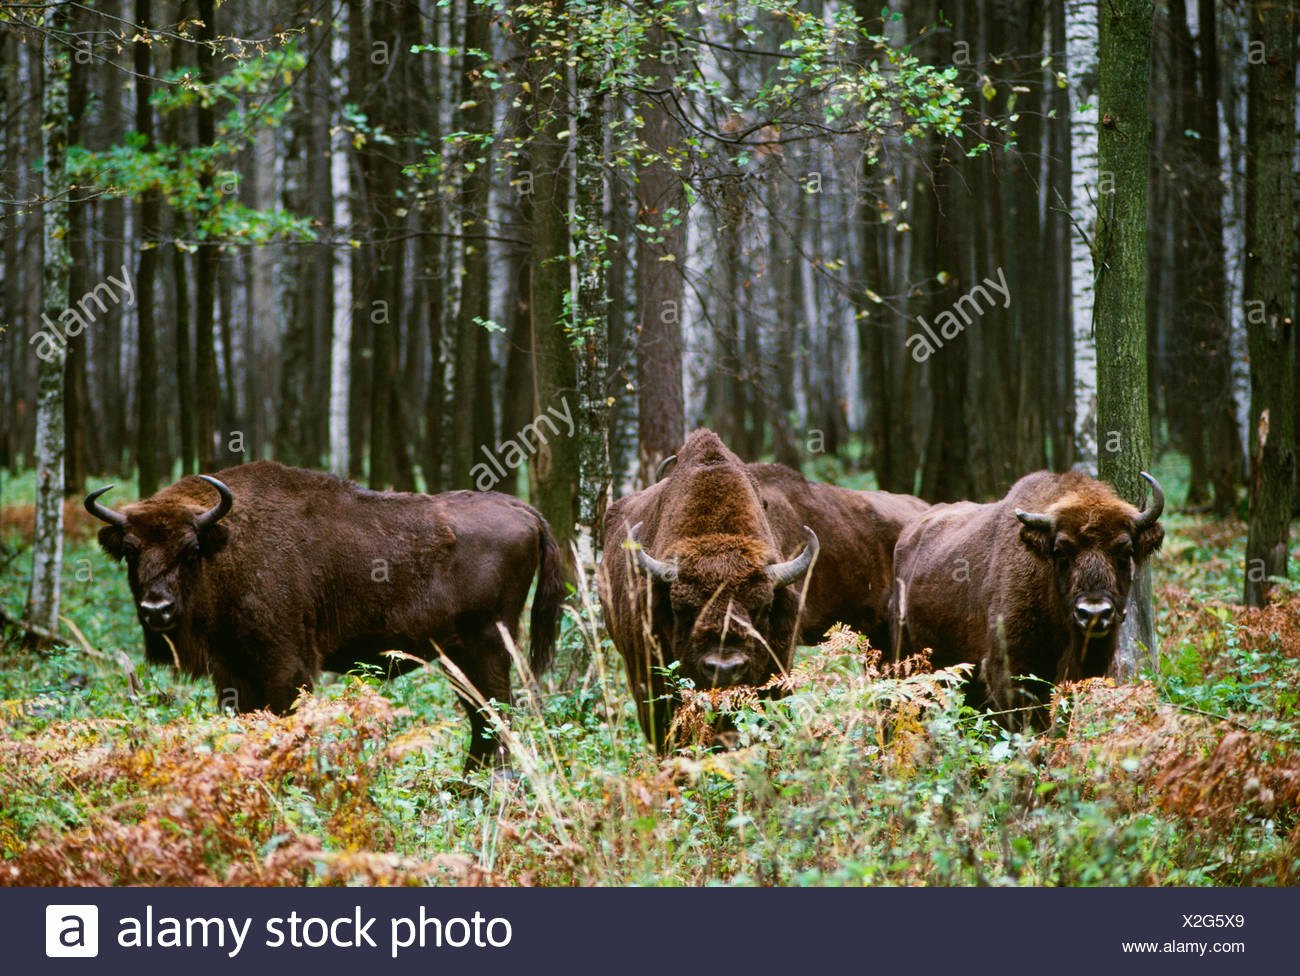 European Bison, Prioksko-Terrasnyy Reserve, Russia - Stock Image